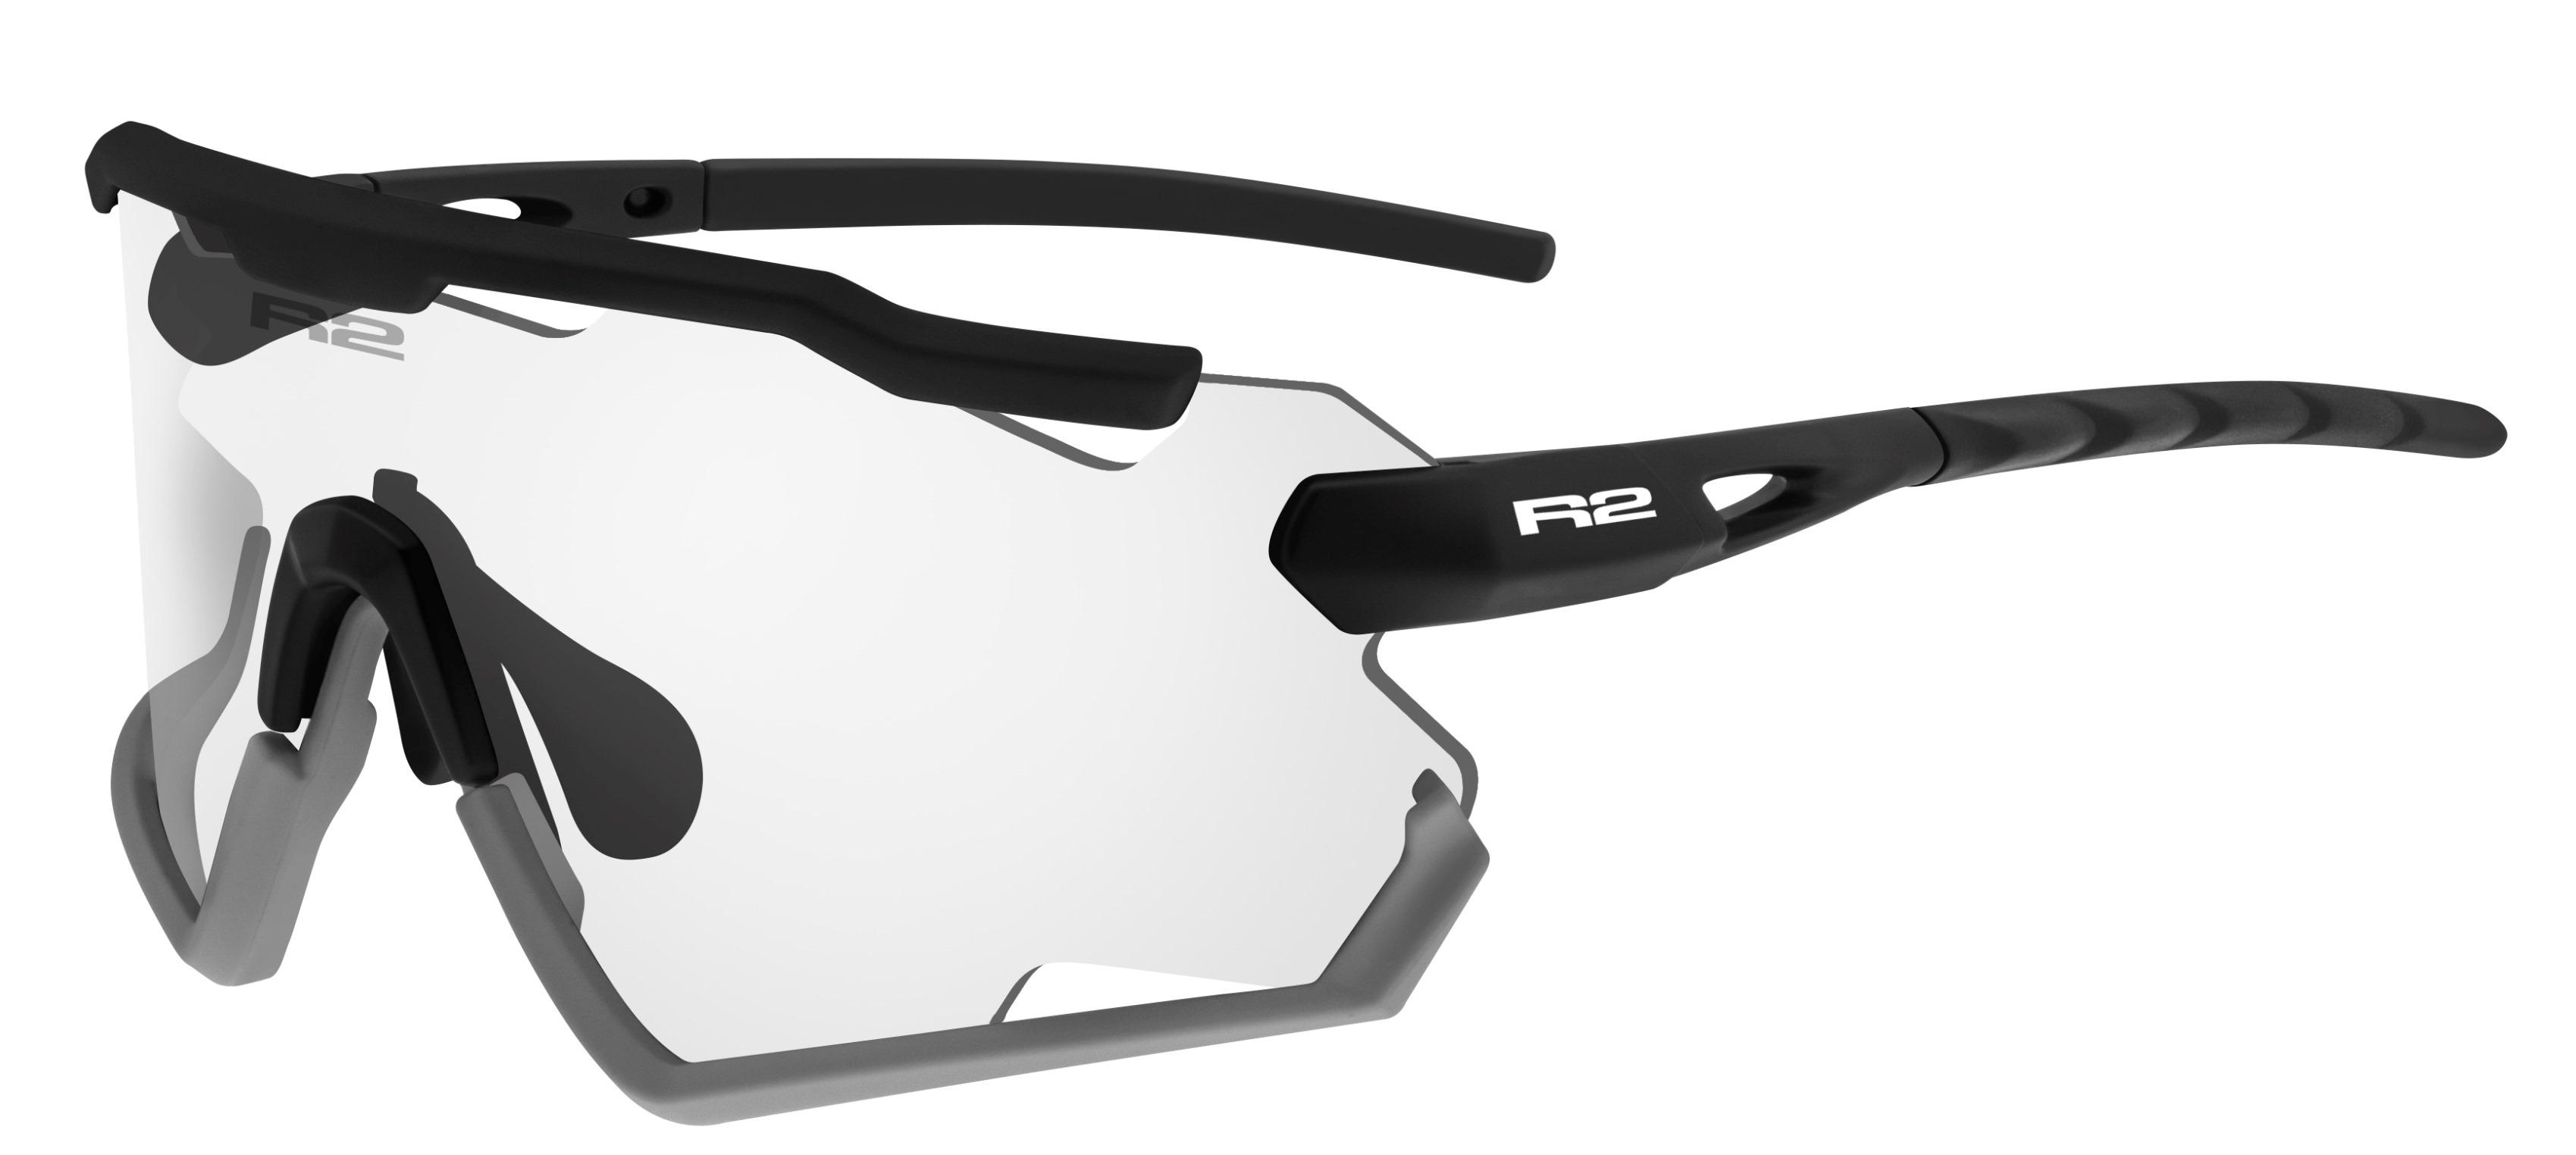 R2 - RIDE YOUR RACE Diablo Cykelbriller Fotokromisk